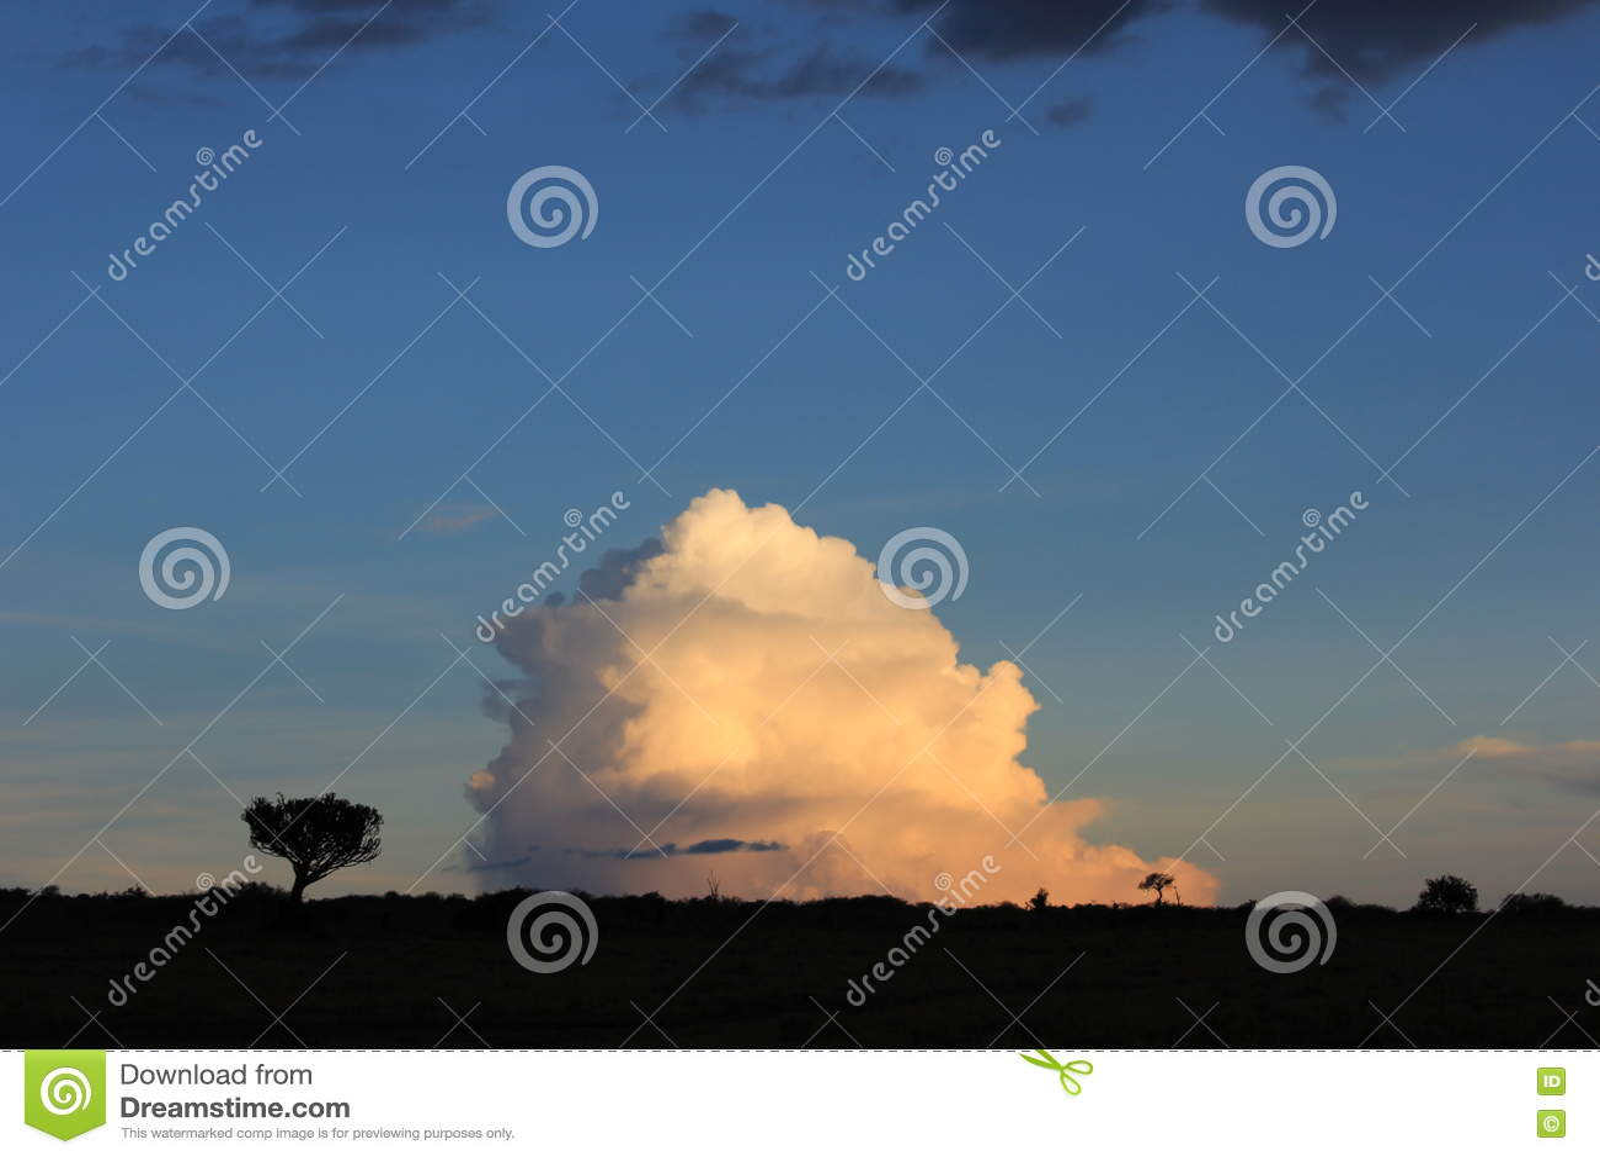 Drzewa versus chmury 2